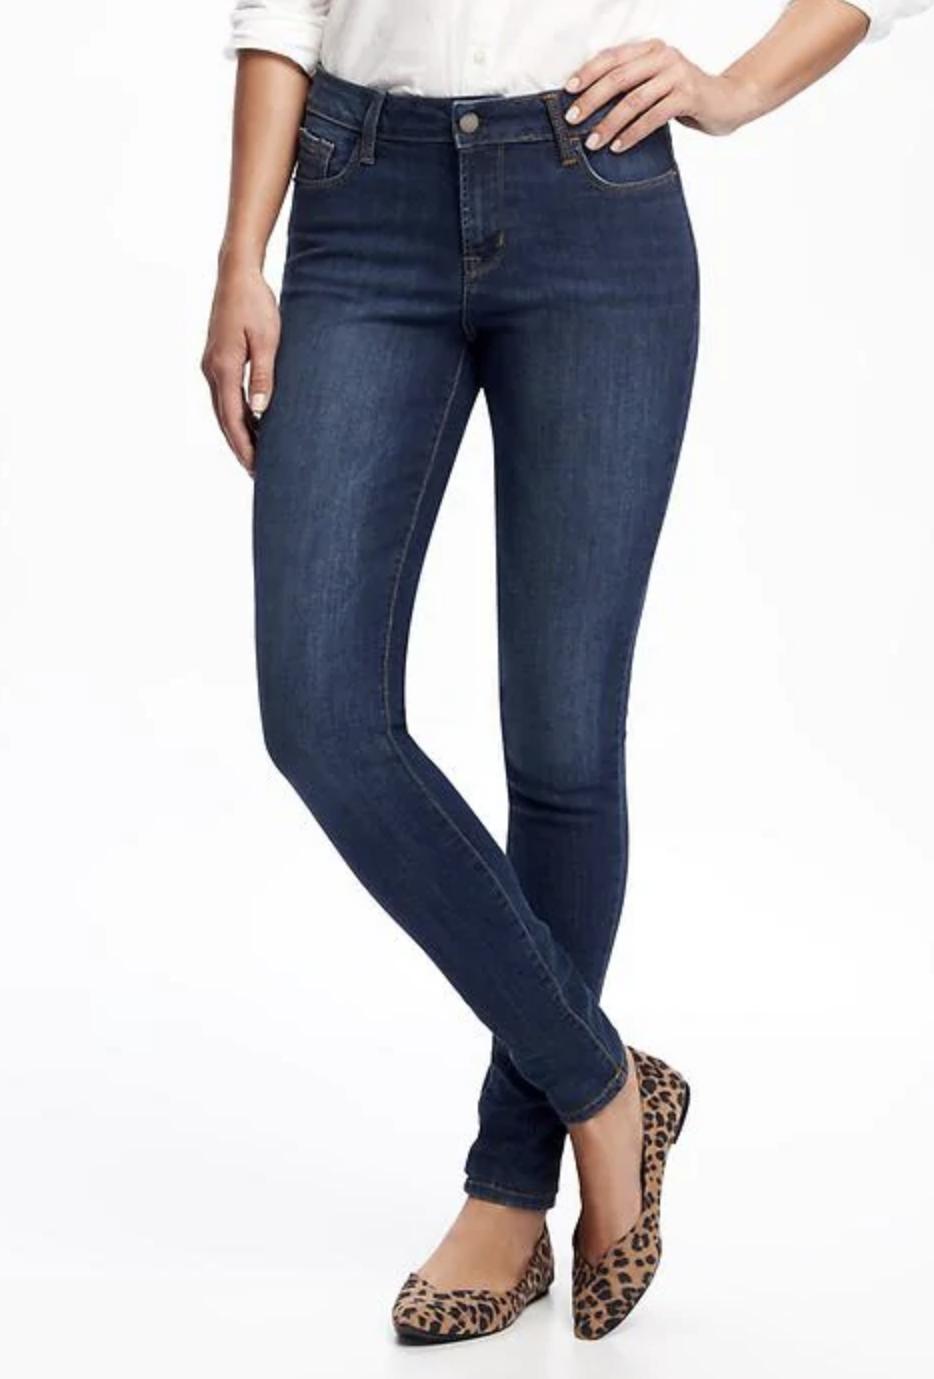 rockstar jeans.png